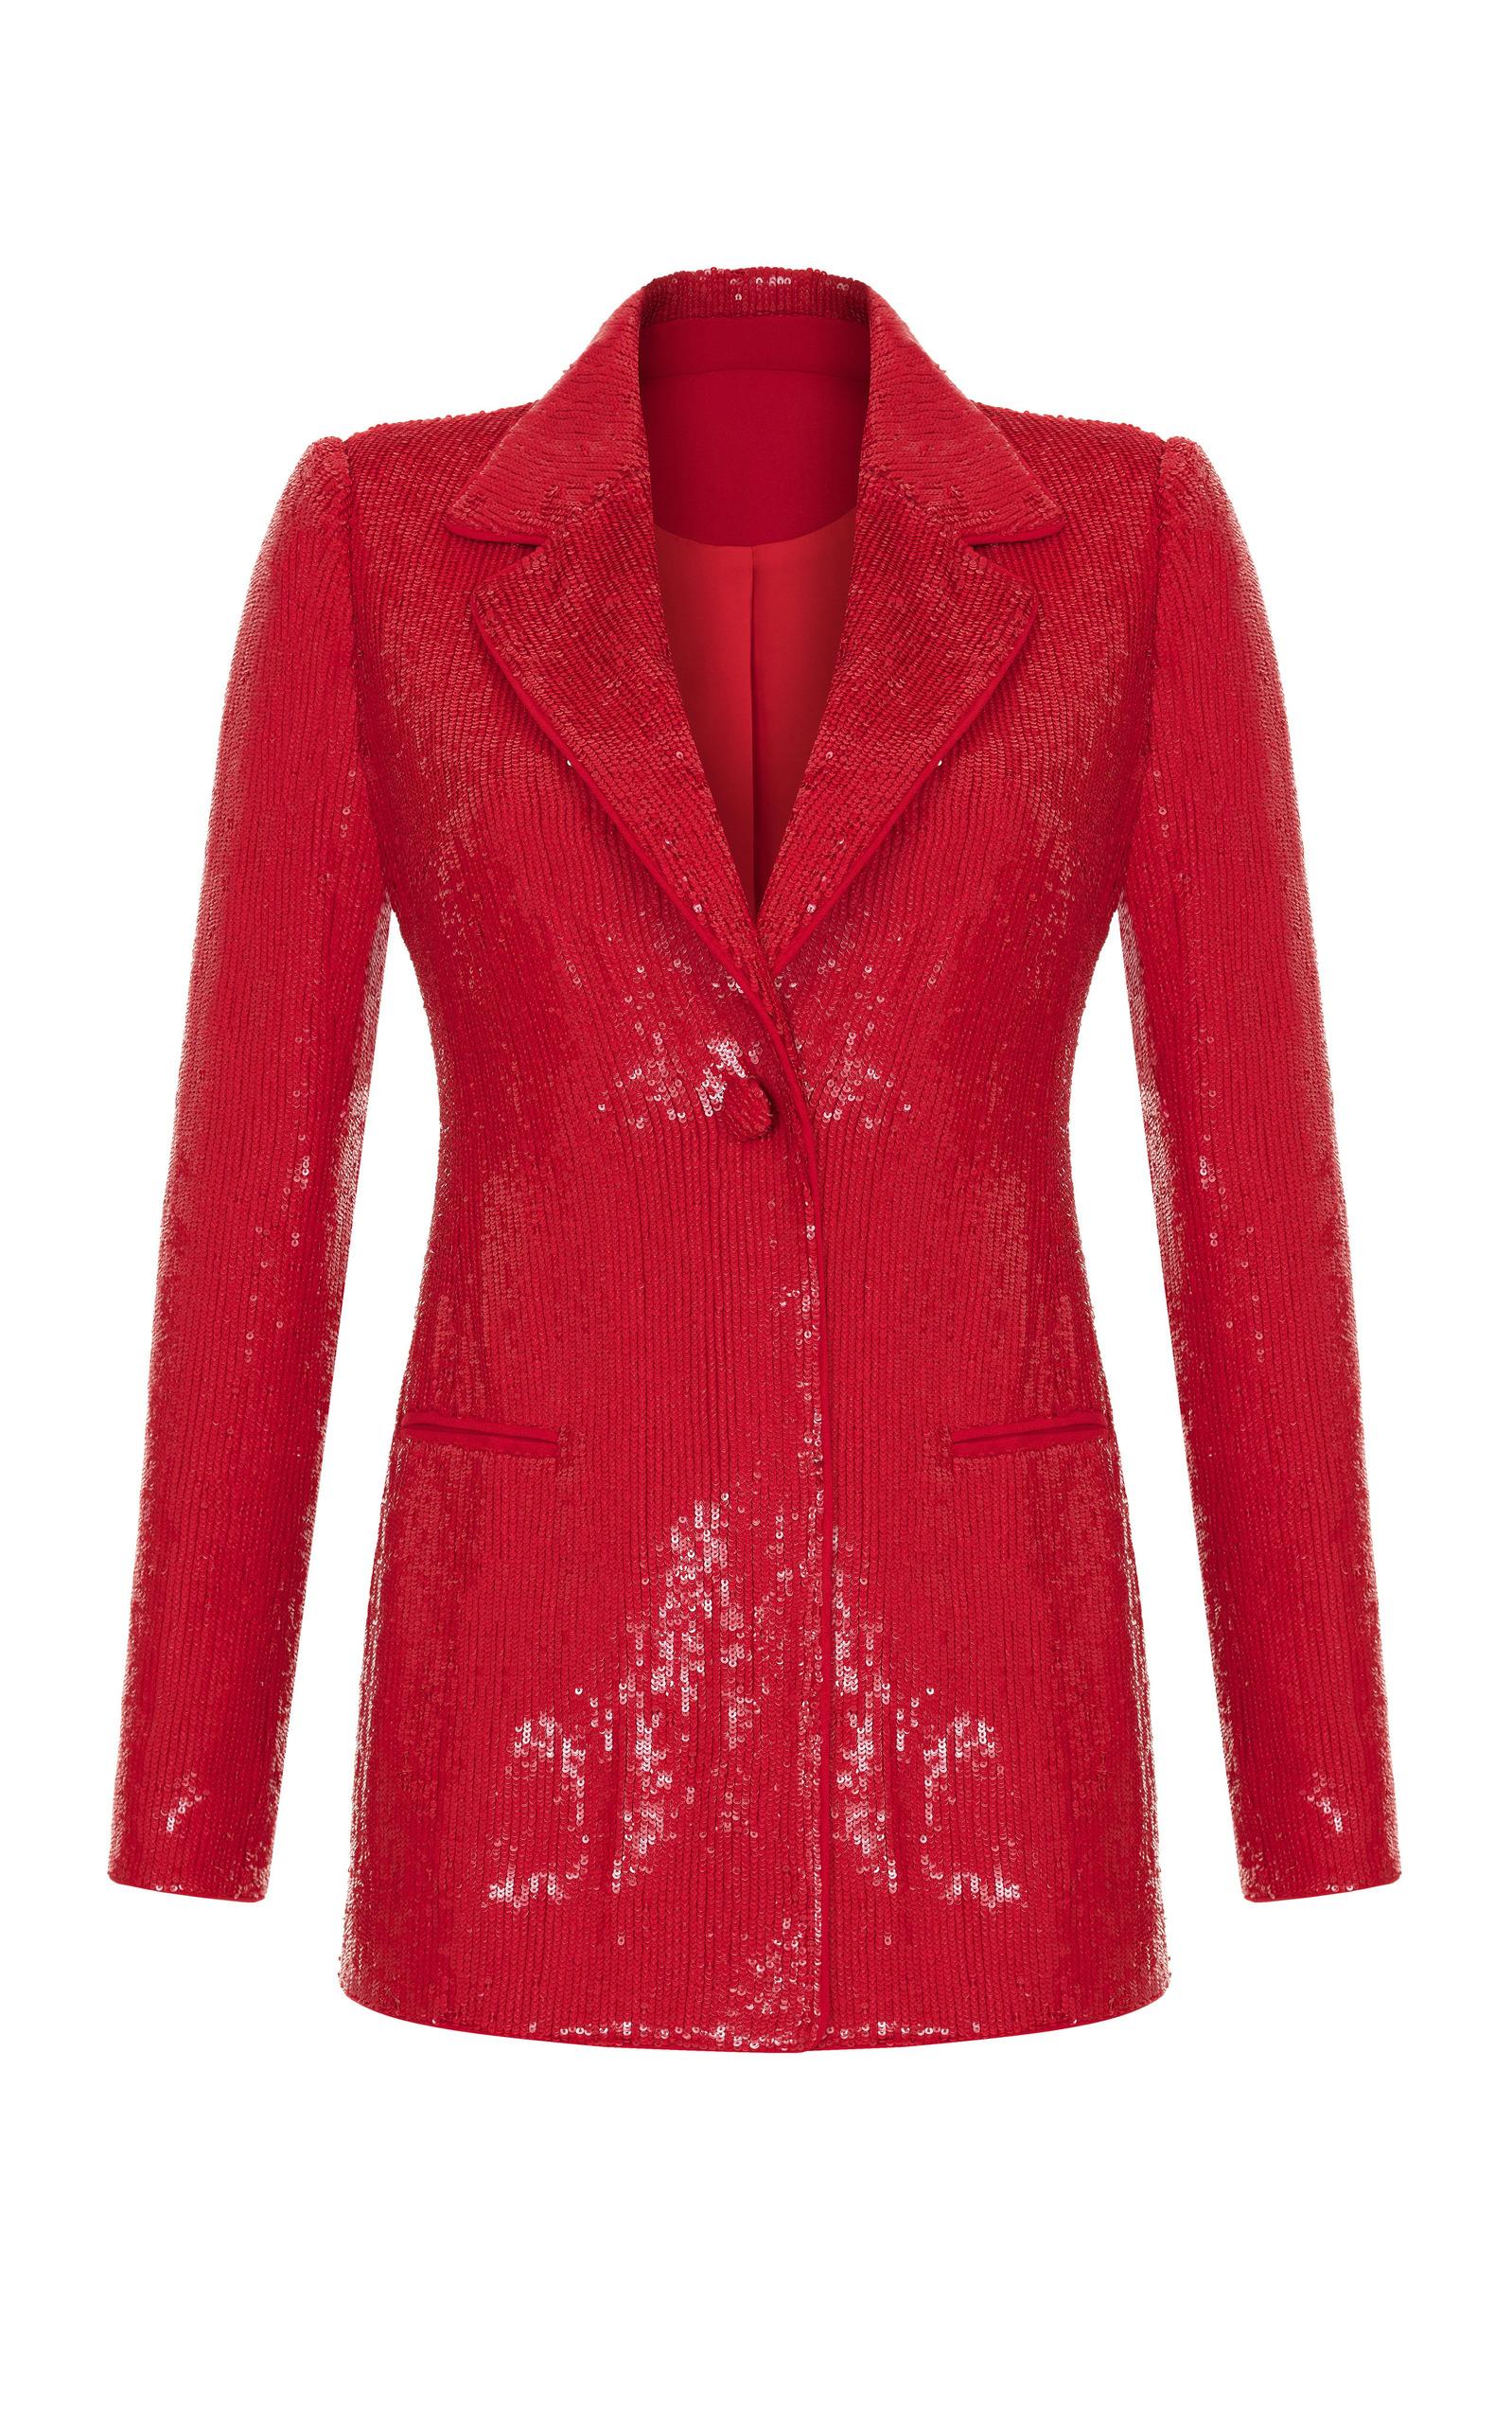 9bbbebffd43 Sequin Jacket by Rasario